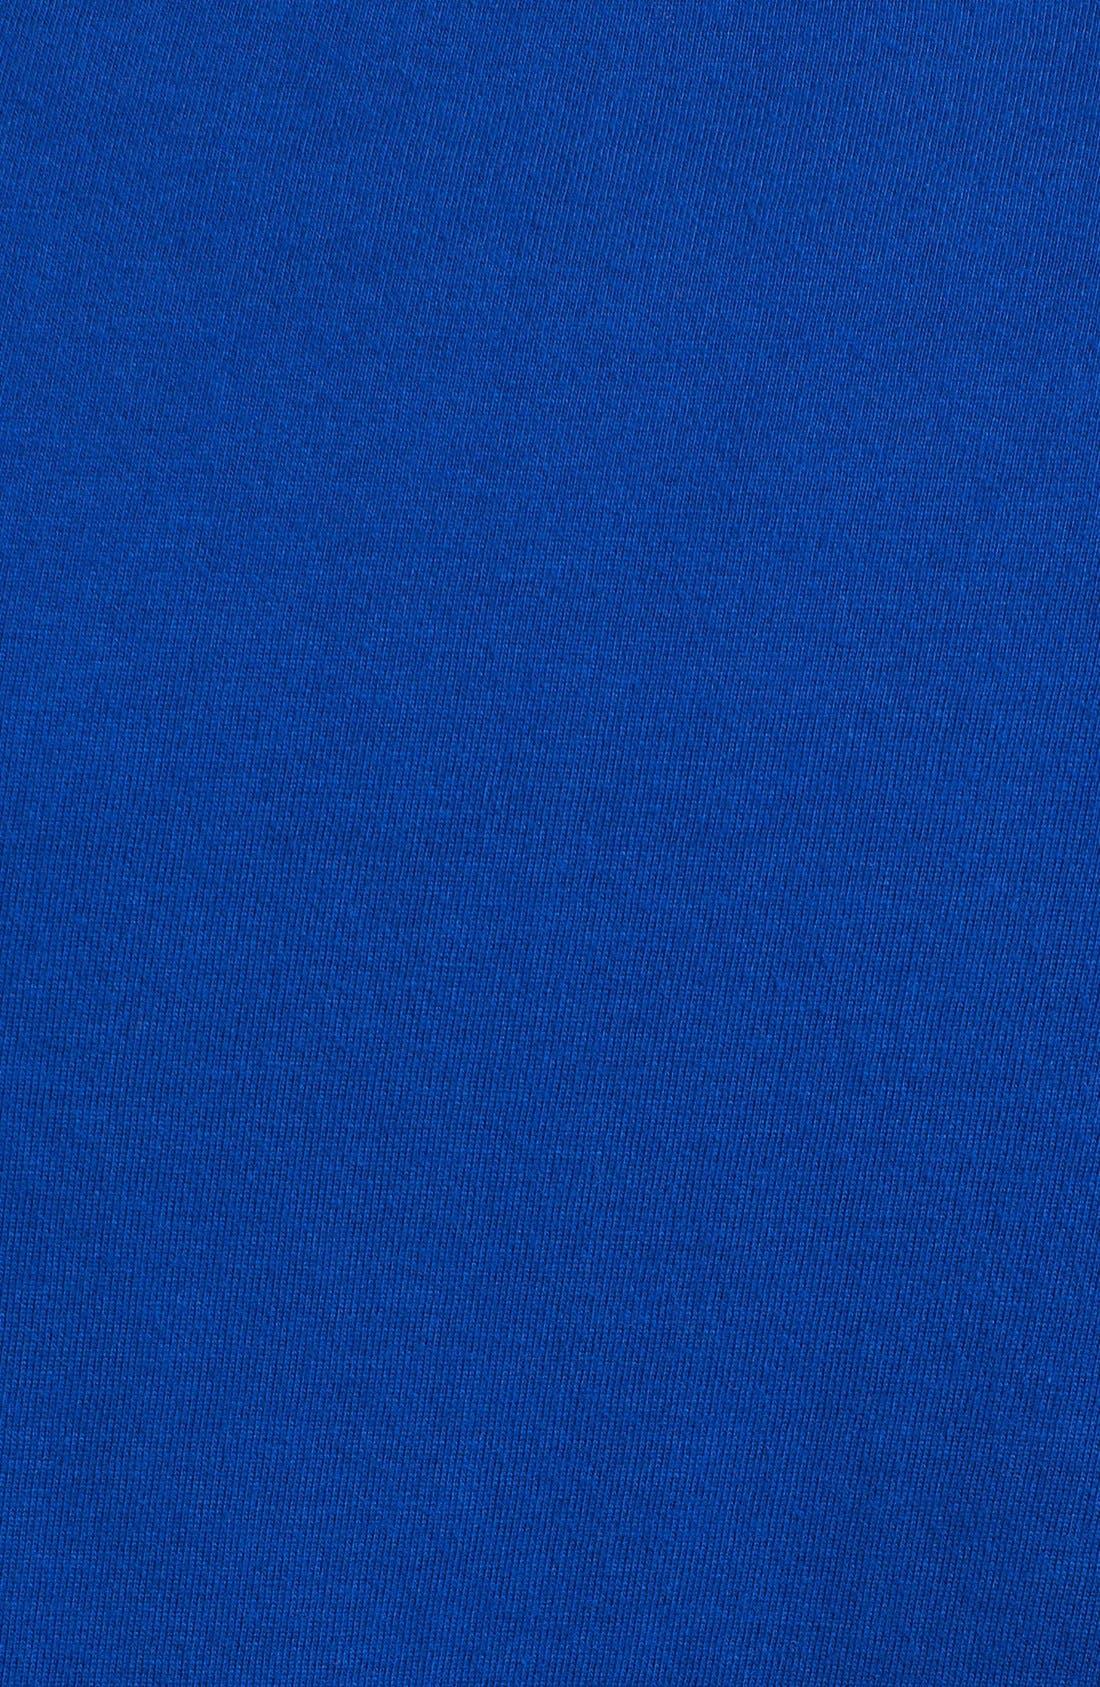 Alternate Image 3  - Wright & Ditson 'Chicago Cubs' V-Neck T-Shirt